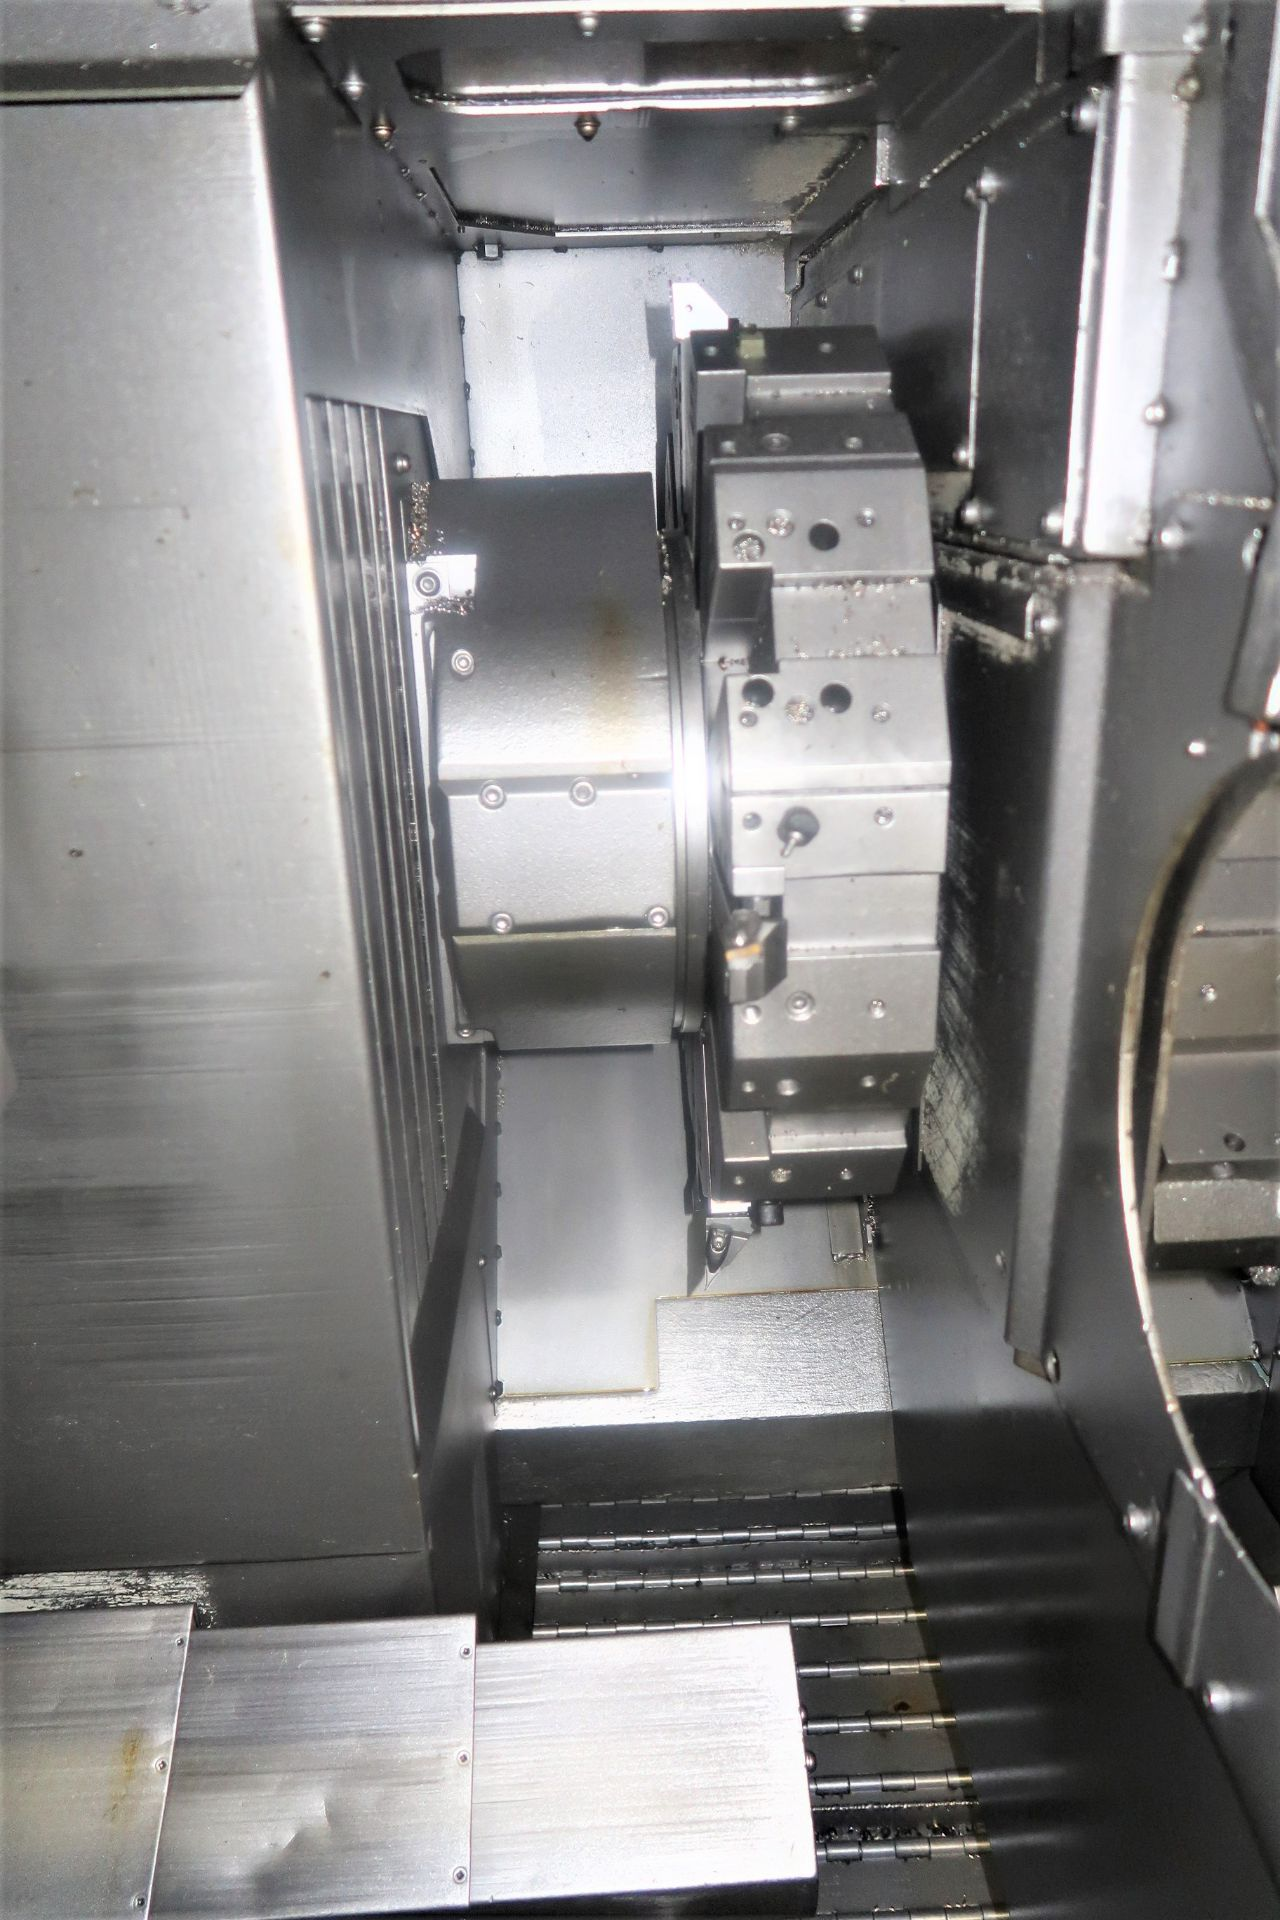 Mazak Dual Turn 25 Twin Spindle CNC Turning Center lathe, S/N 150888 - Image 6 of 13